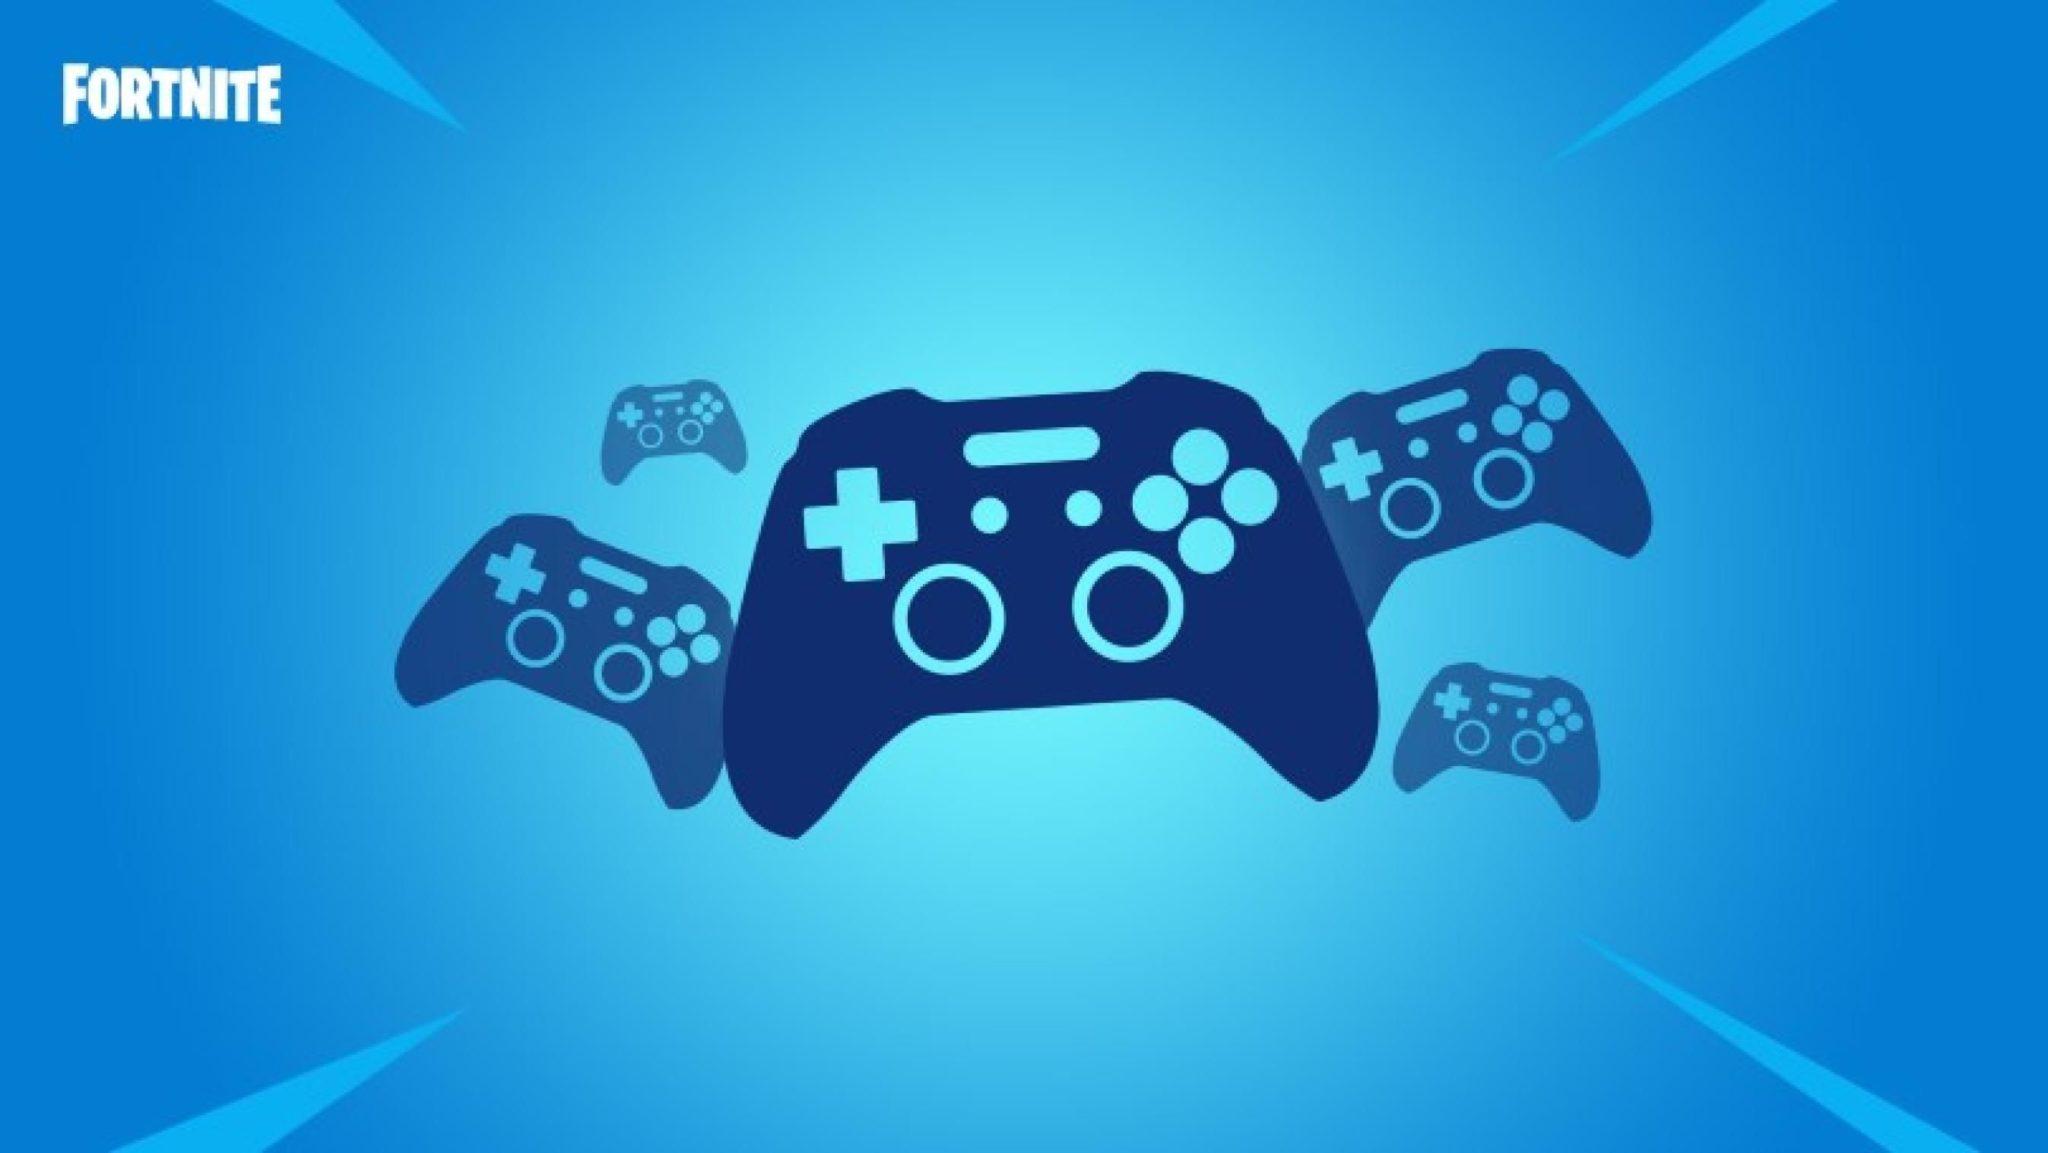 Fortnite Epic Games Aim assist manette